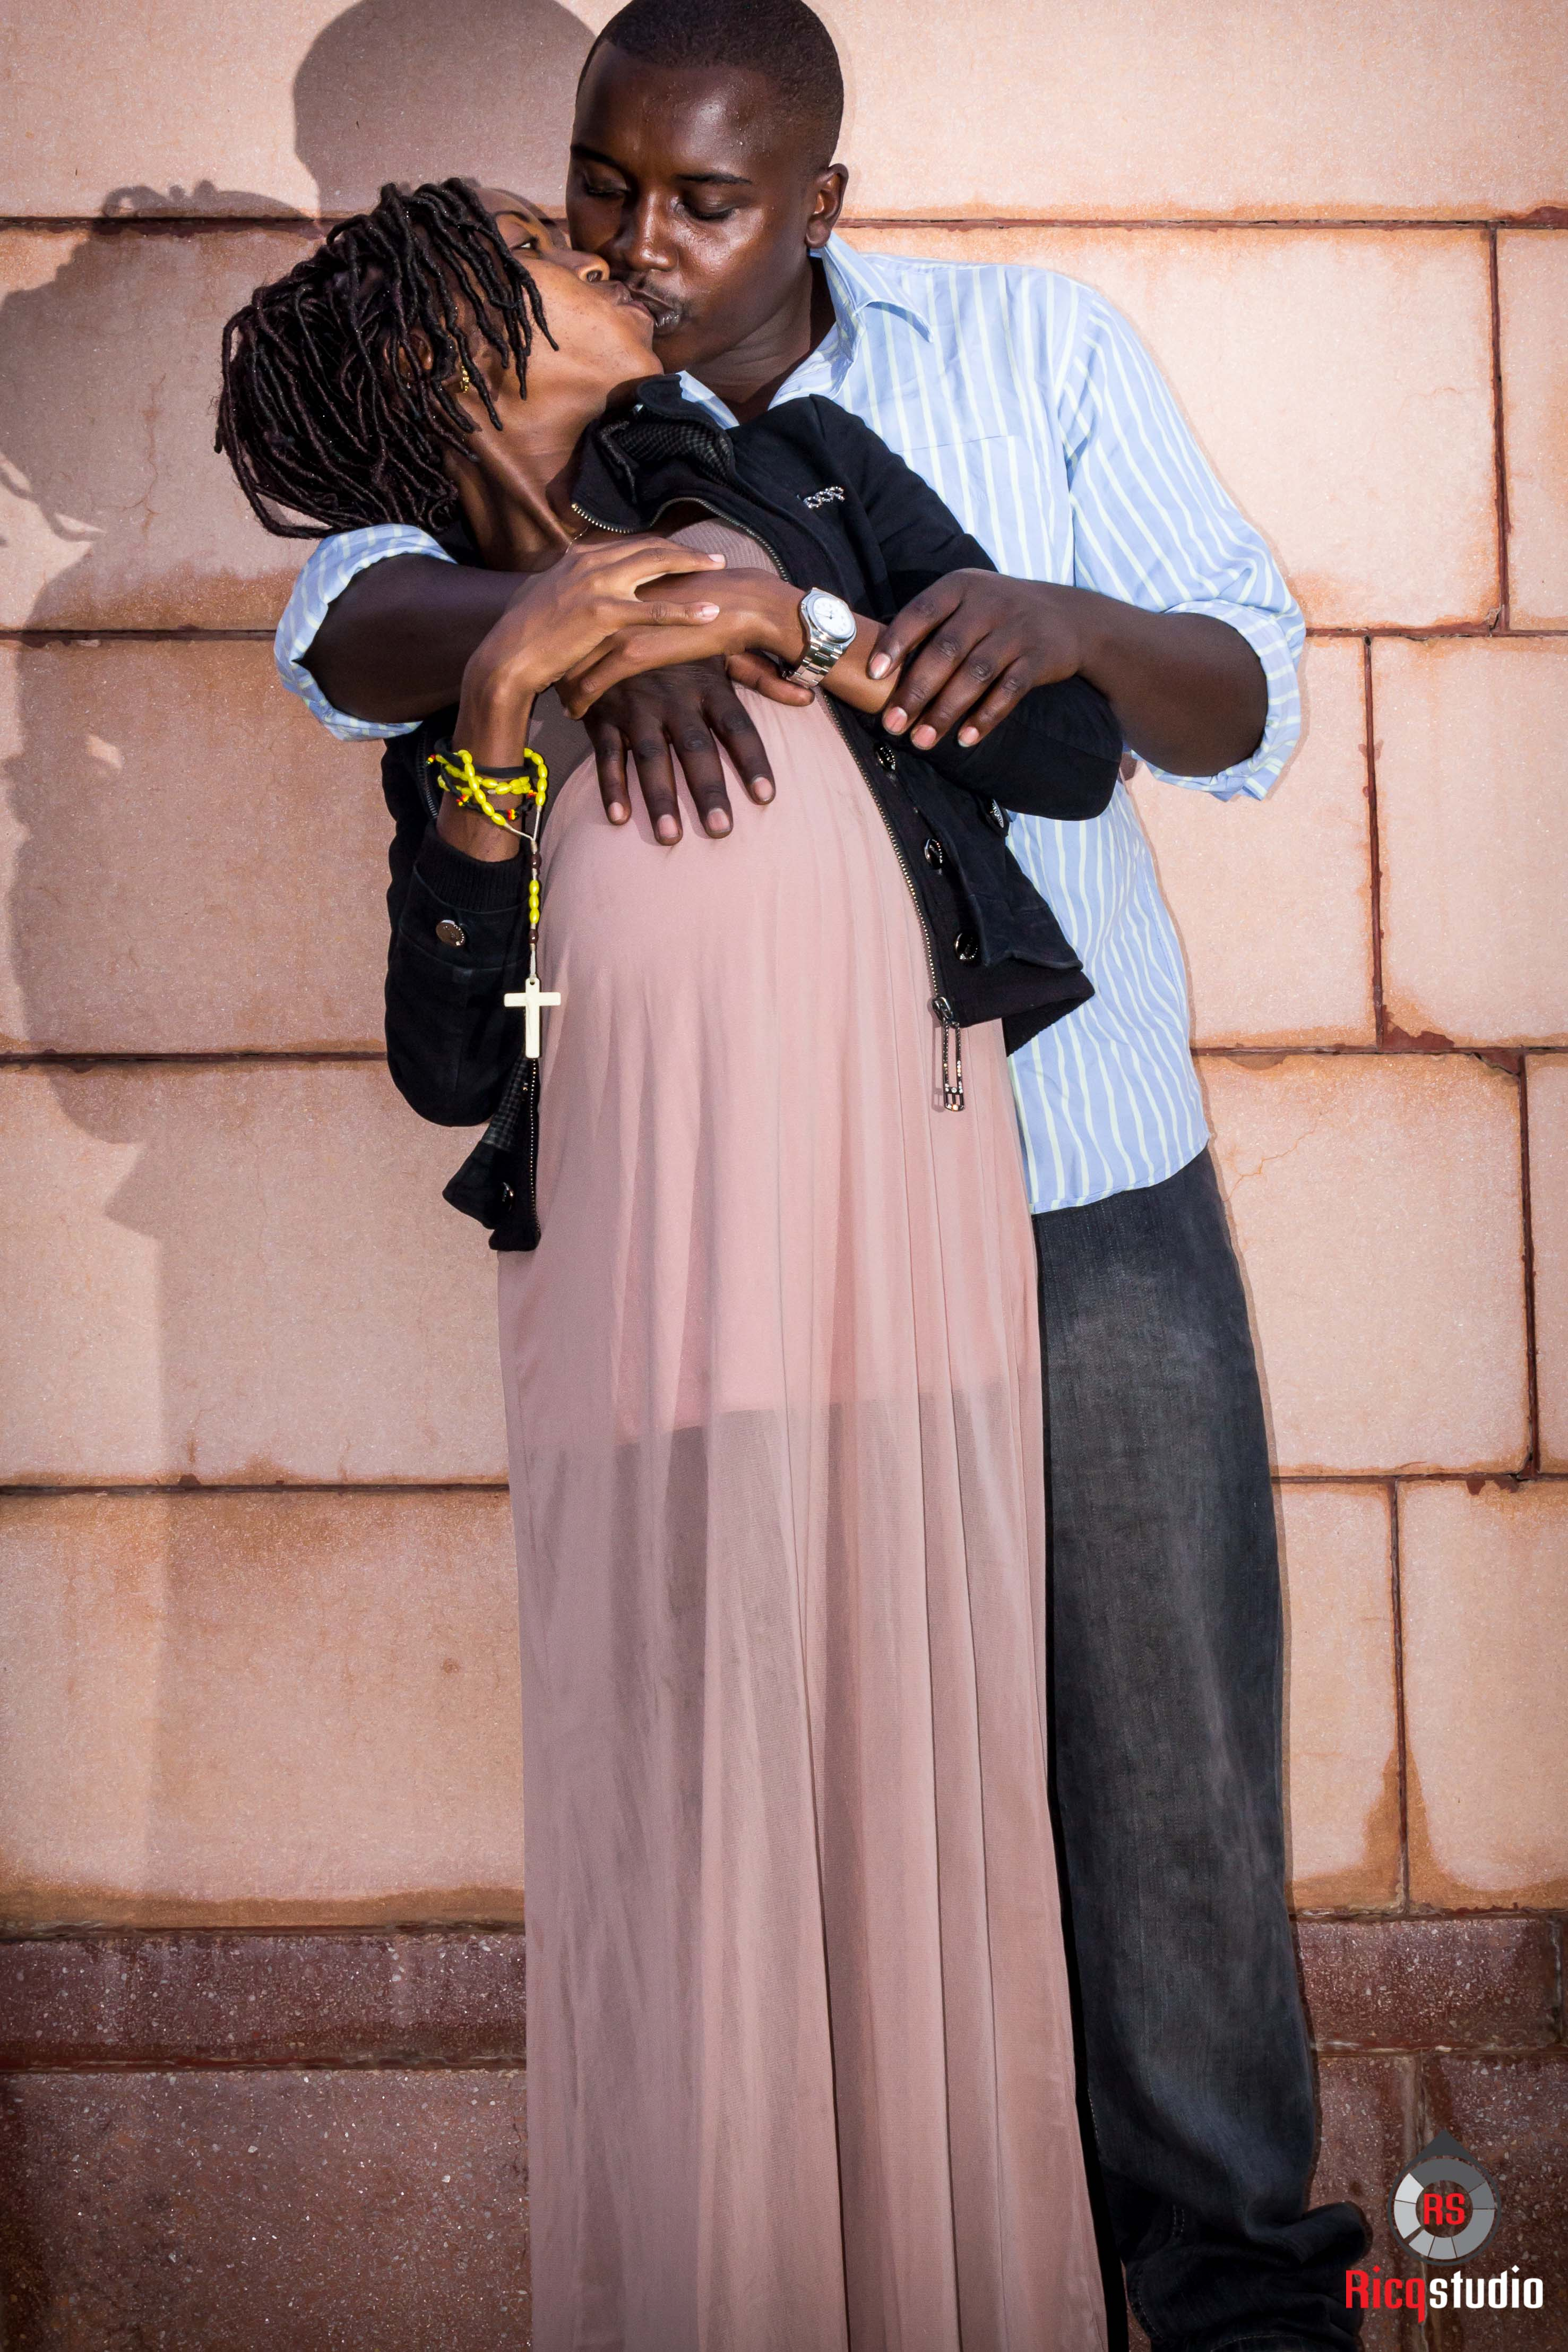 wedding photographer_ engagement in Kenya_ricqstudio-82